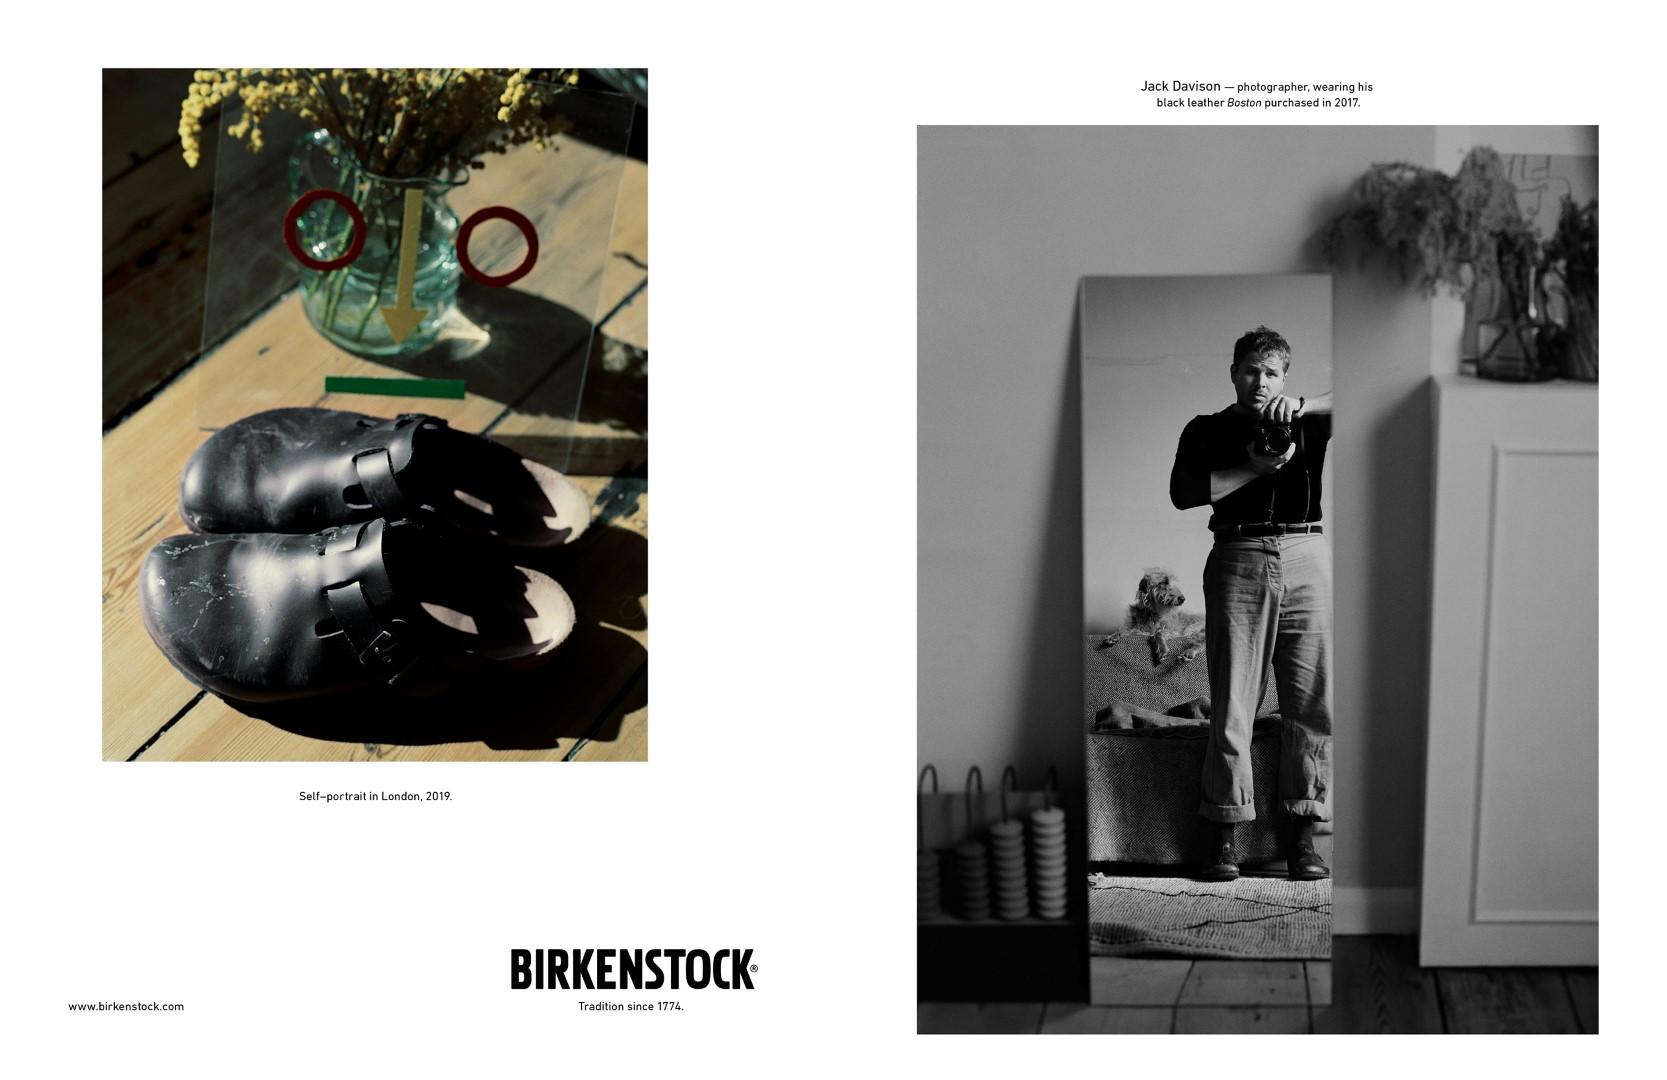 Birkenstock campagna Personality 2019